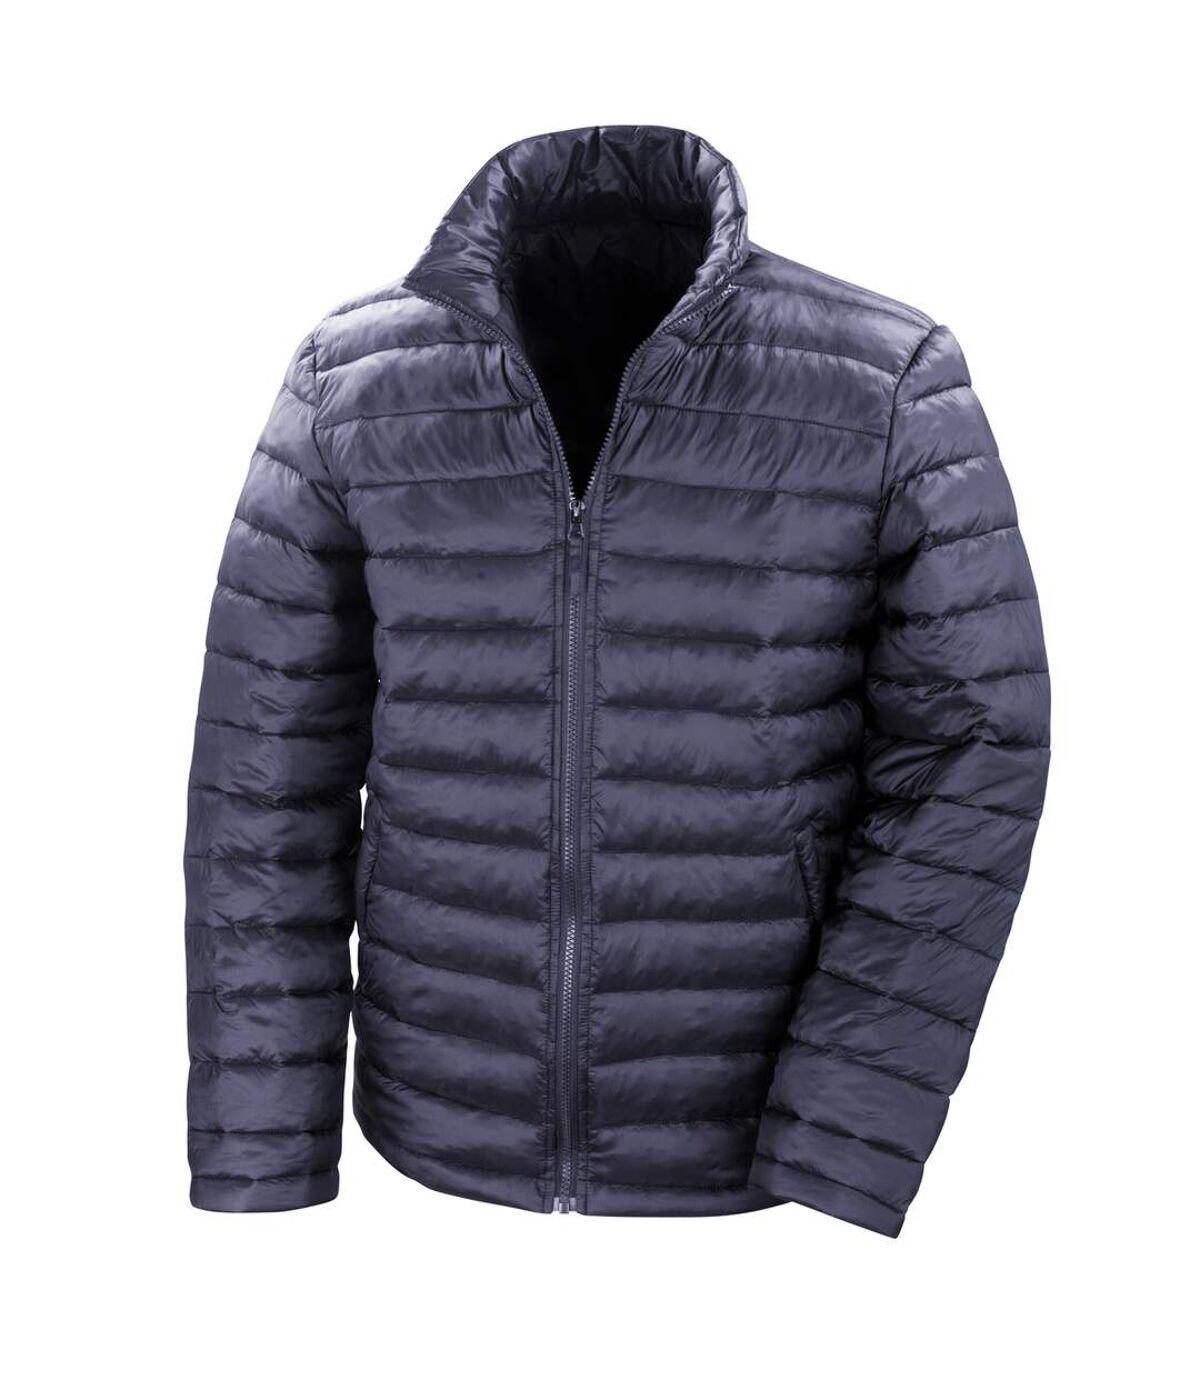 Result Mens Ice Bird Padded Winter Jacket (Water Repellent & Windproof) (Navy Blue) - UTBC2048